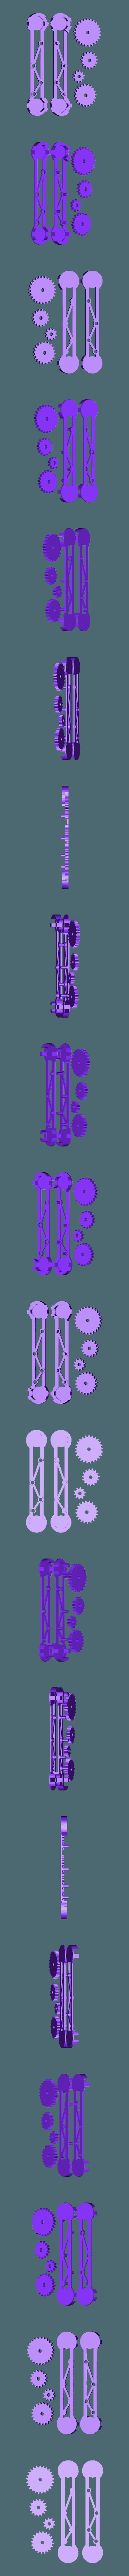 Prueba_con_engranajes.stl Download free STL file Learning toy - Gear combination • 3D printer template, raulrrojas